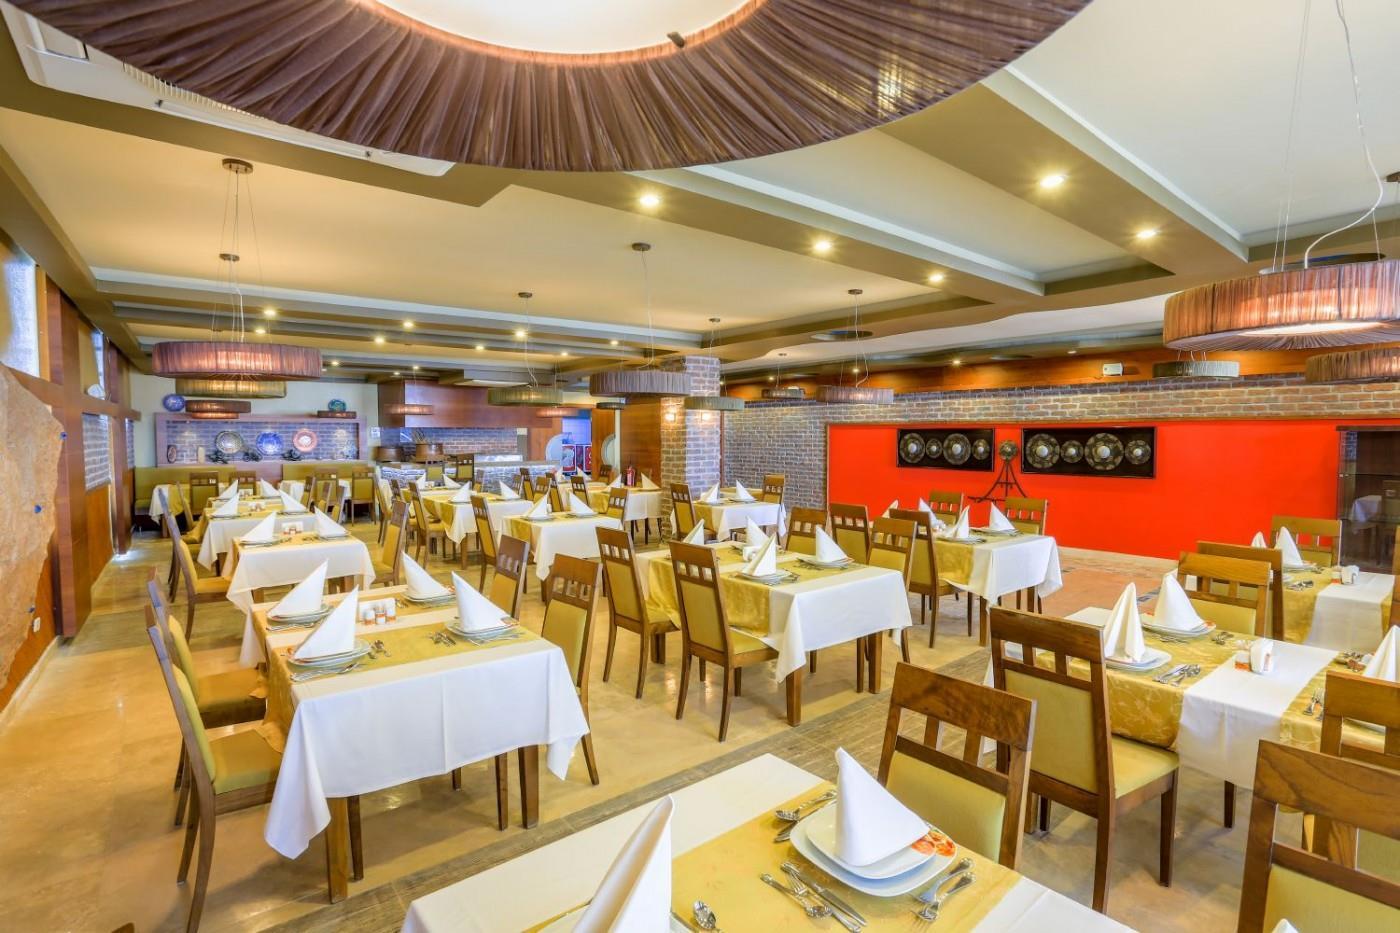 http://www.orextravel.sk/OREX/hotelphotos/thalia-unique-area-0030.jpg